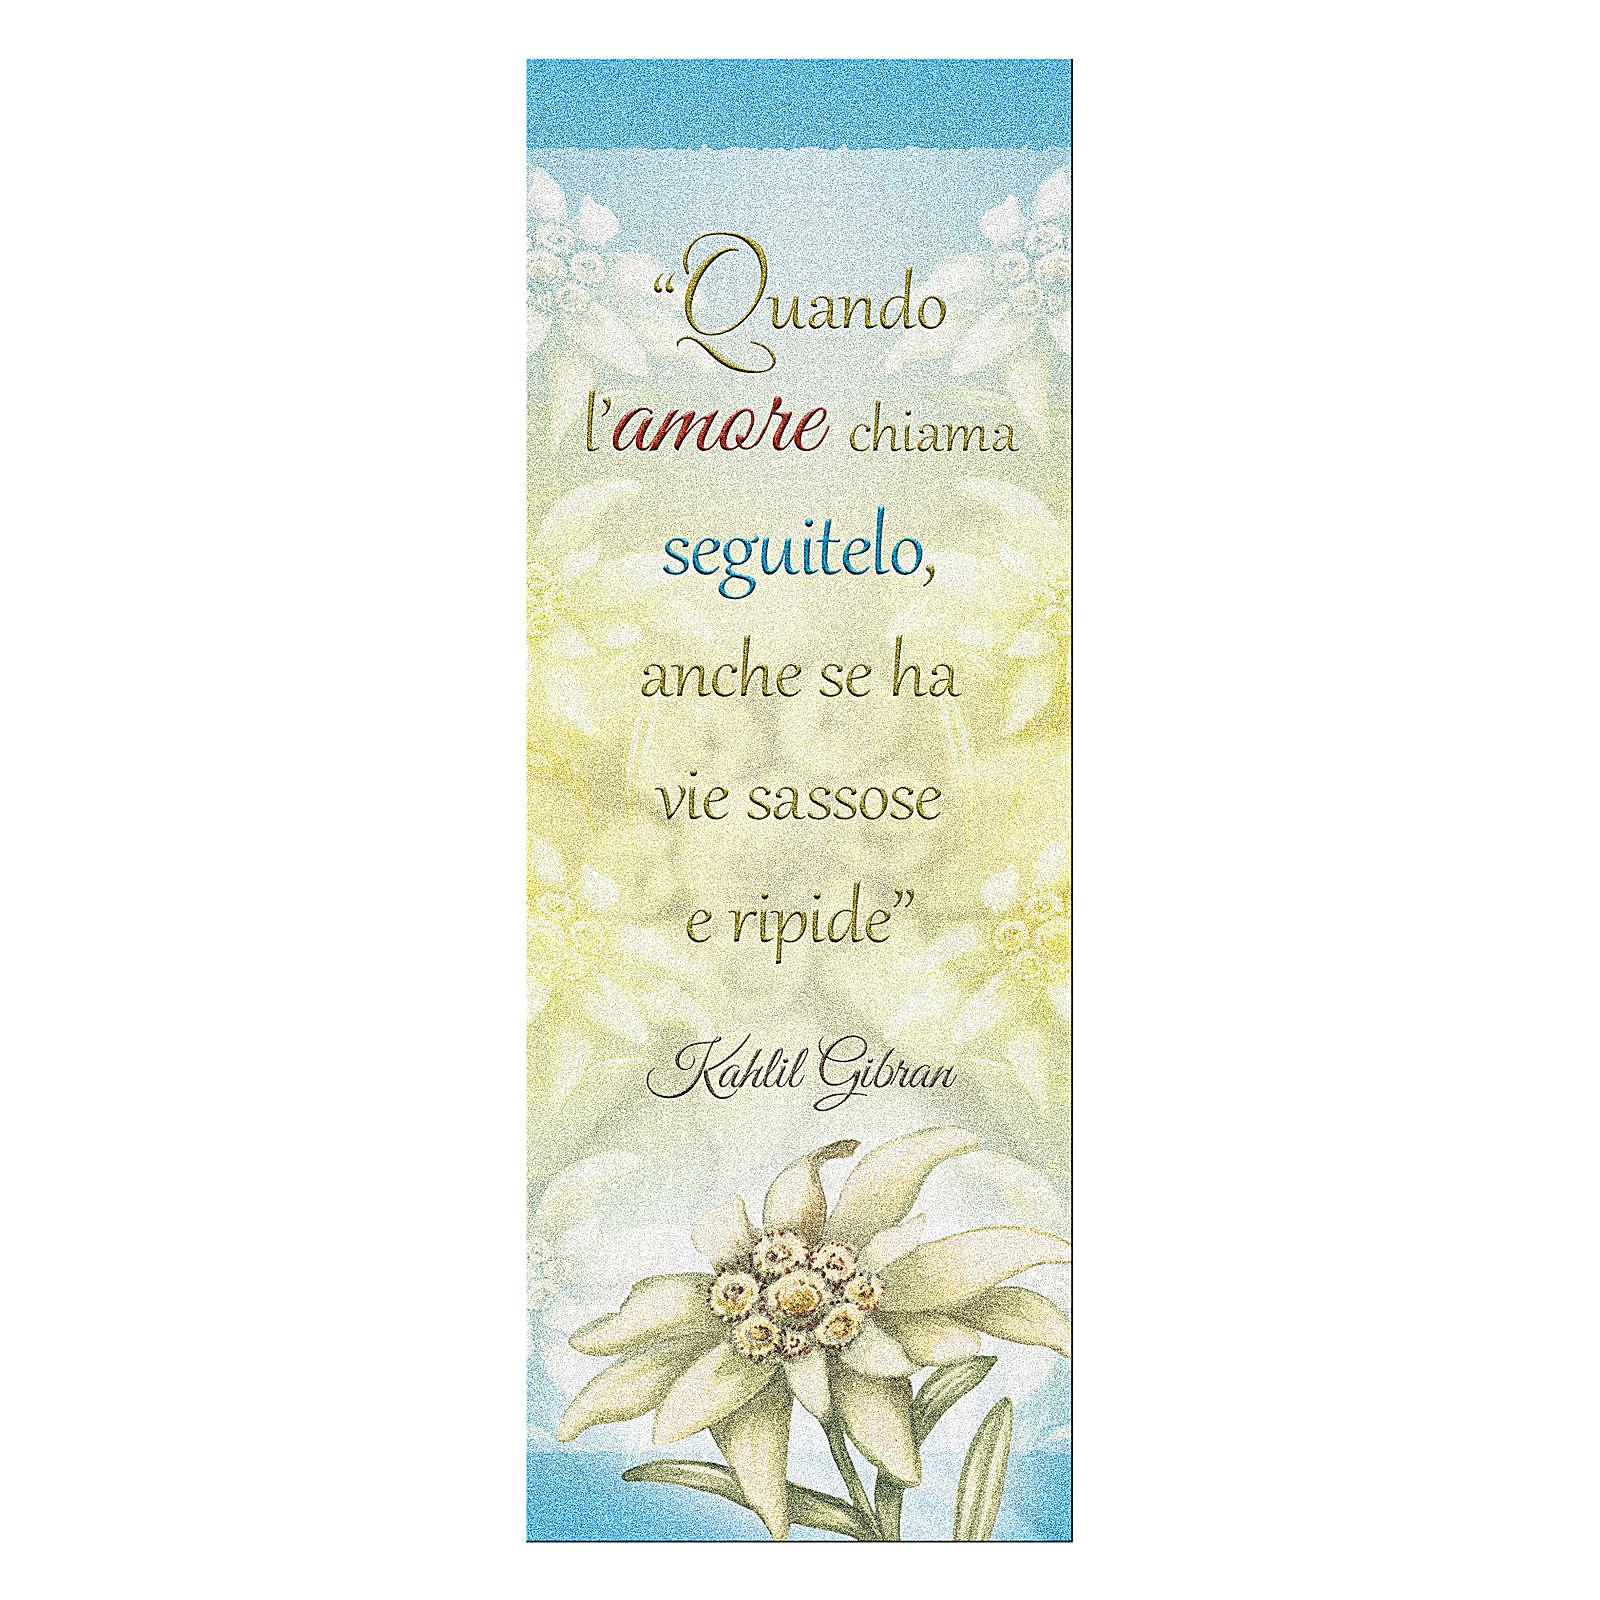 Segnalibro carta perlata Stella Alpina Frase K. Gibran 15x5 cm 4